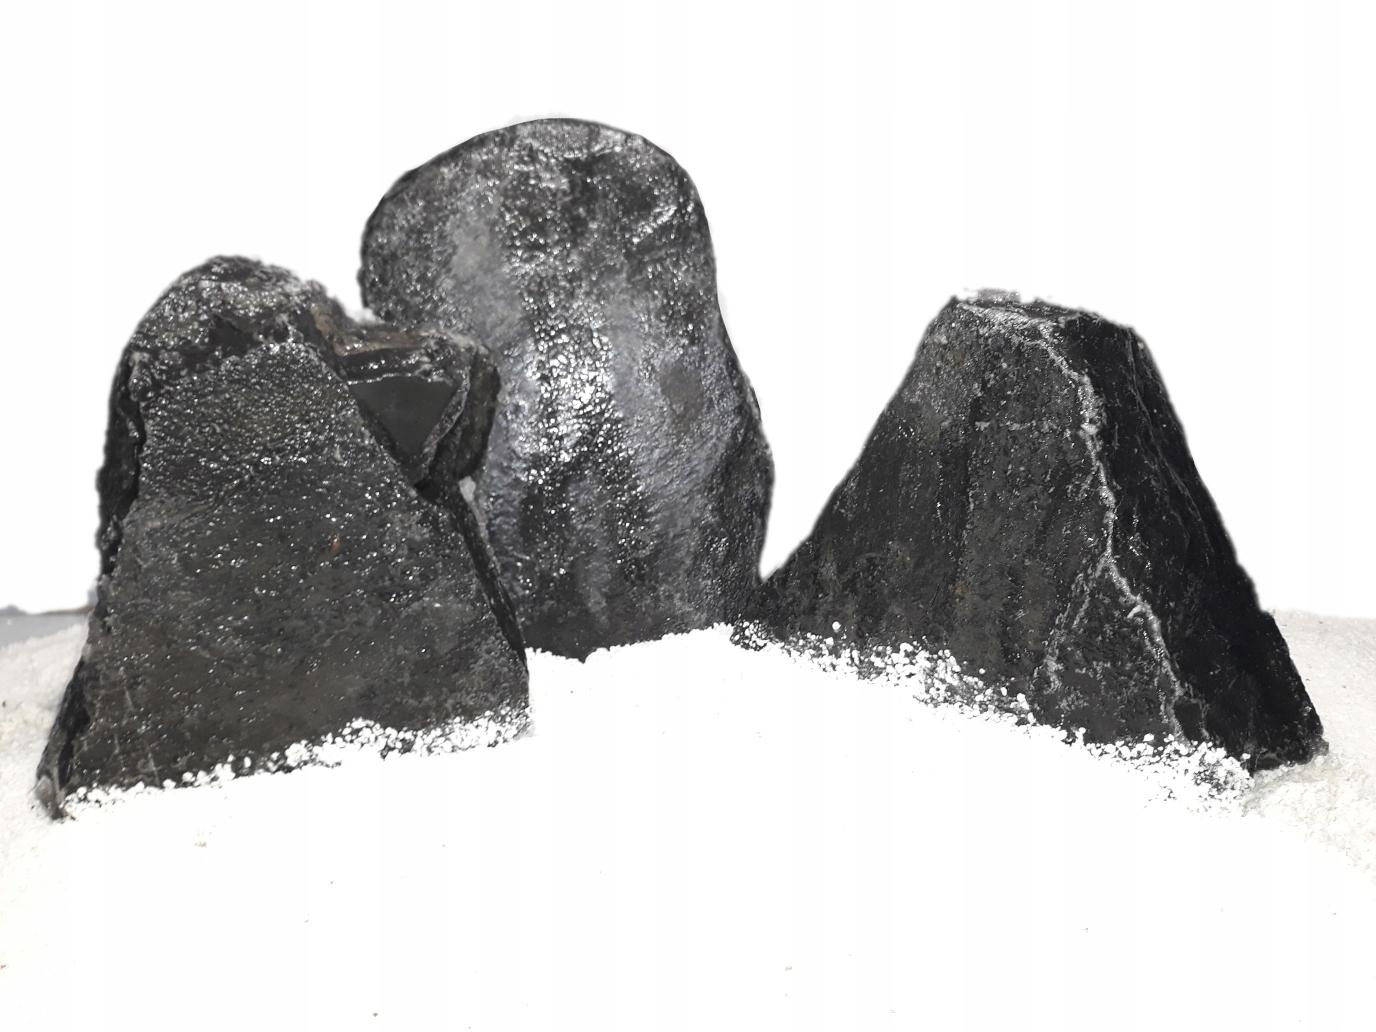 NERO ČIERNA BRIDLICA KAMEŇ AKVÁRIUM JASKÝŇ, 15 kg